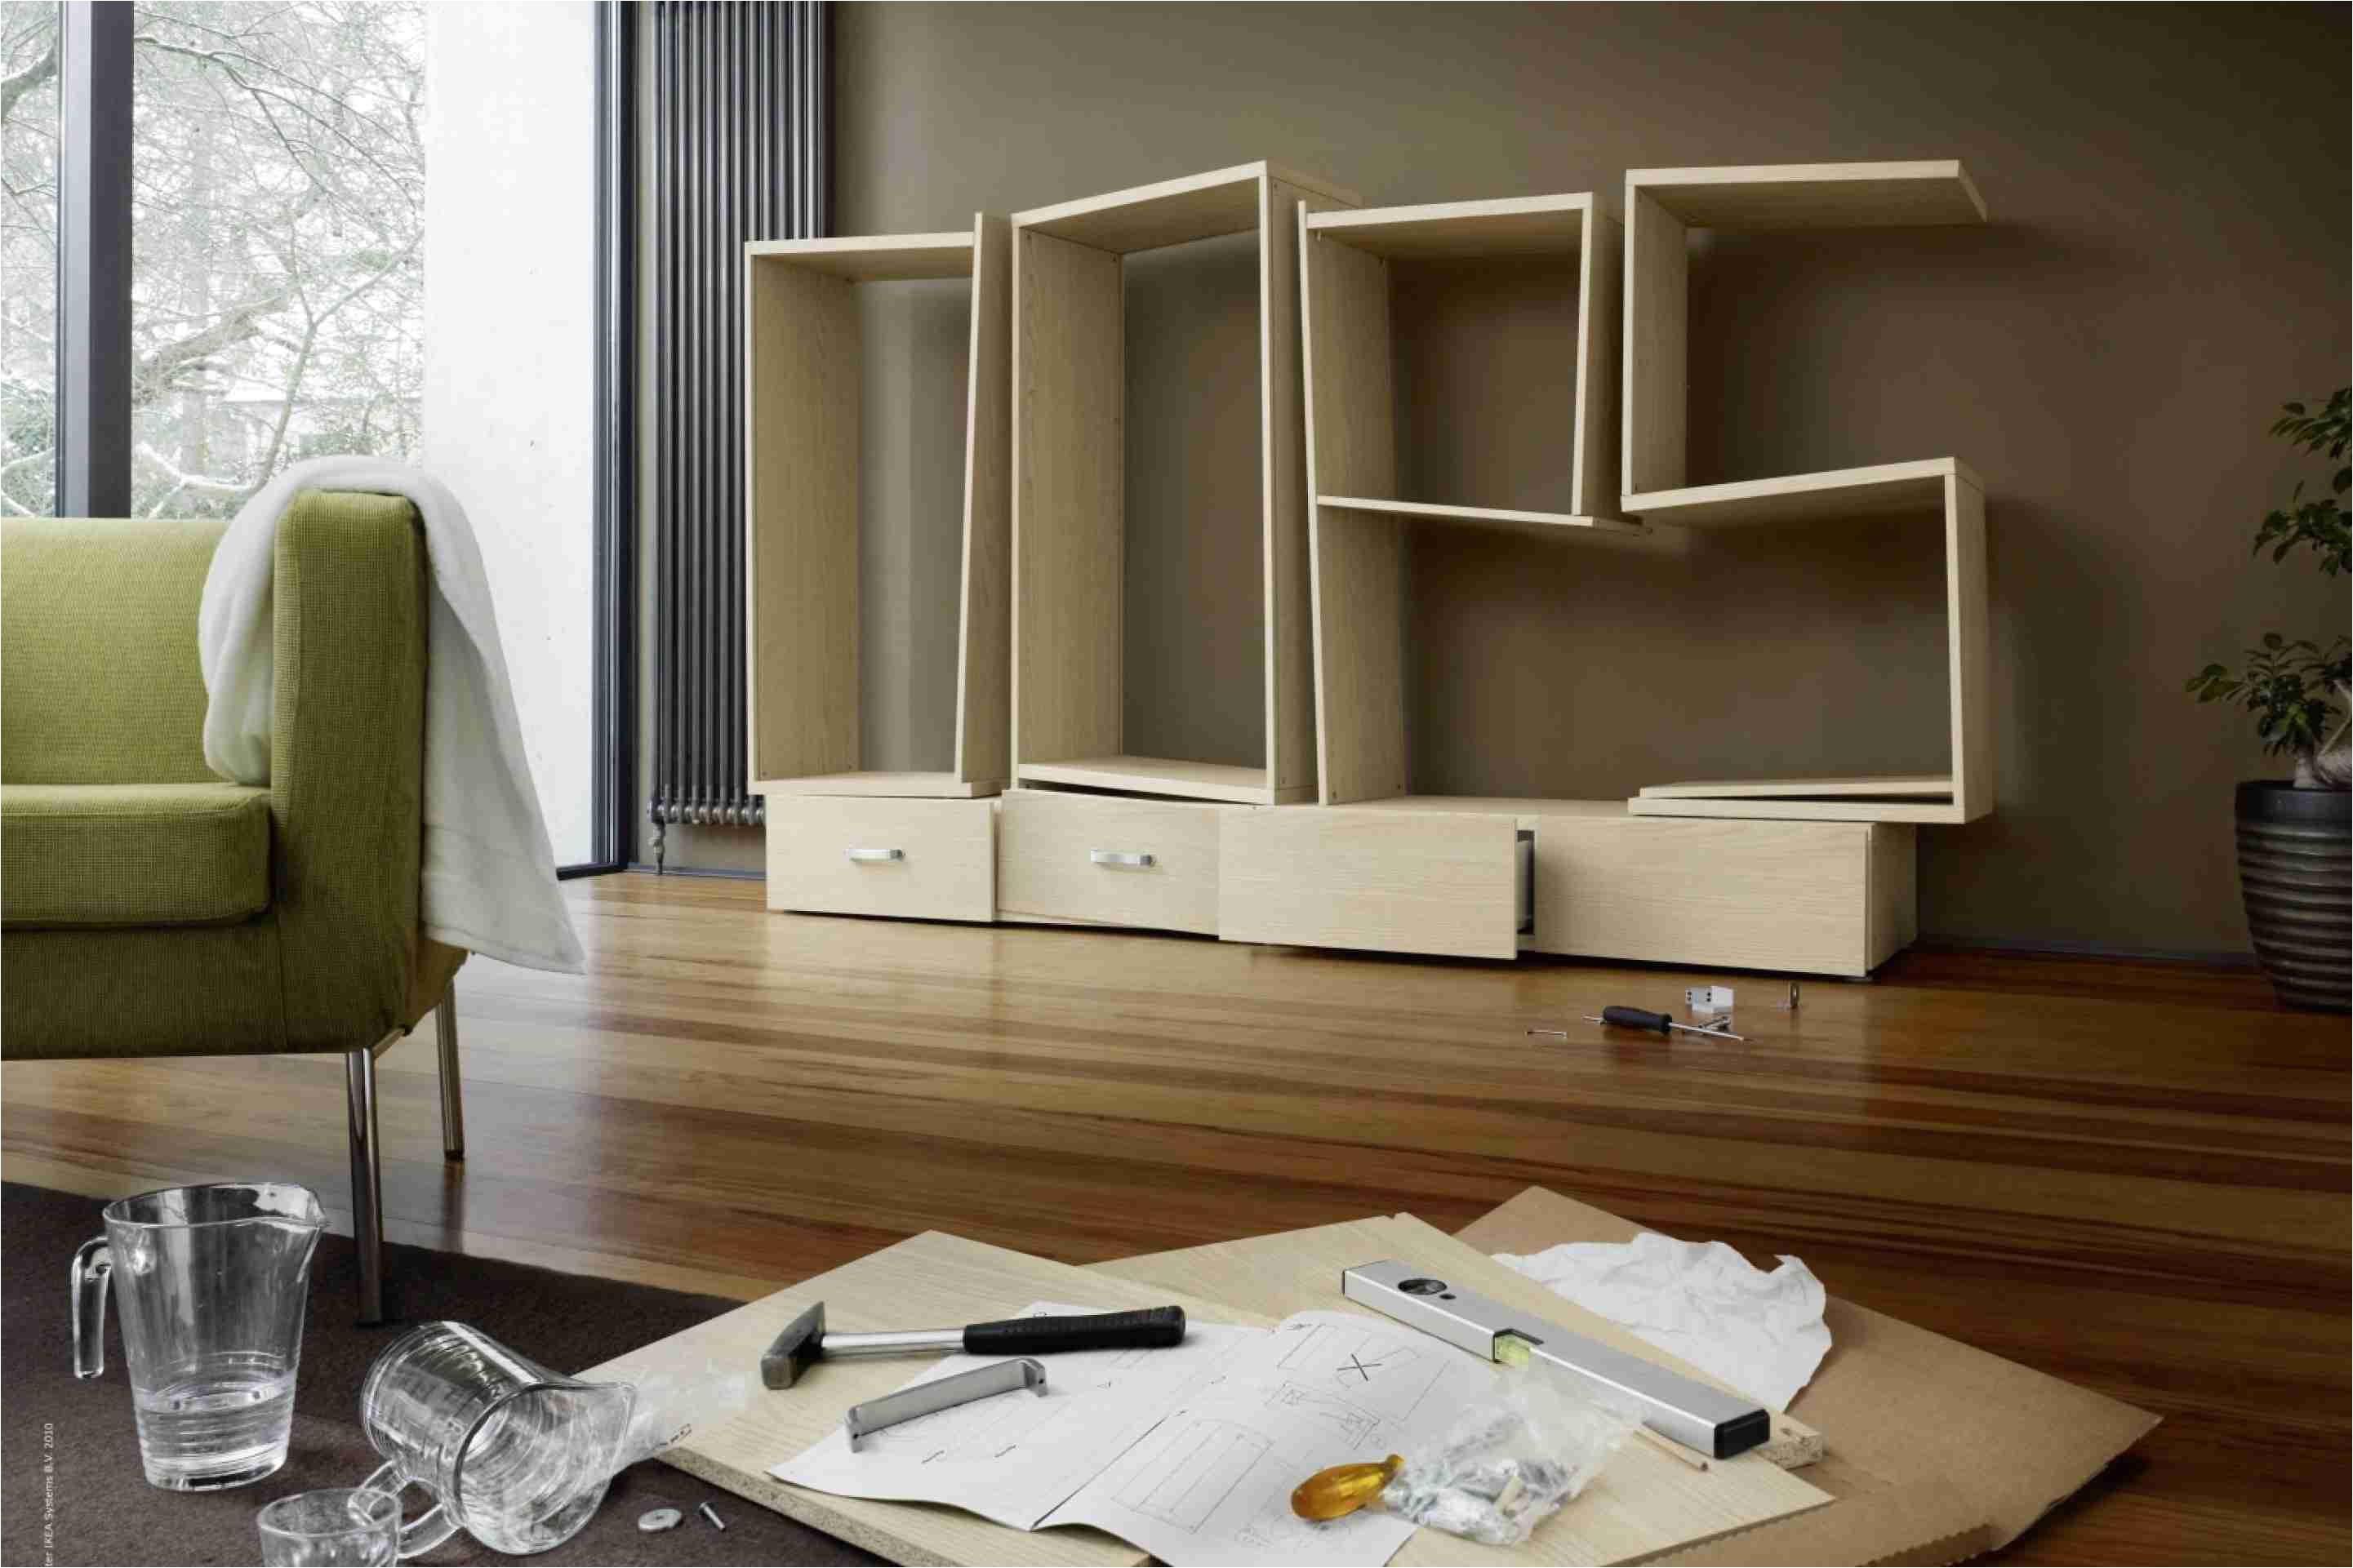 opps assembly ikea furniture via smallspaces about com 57c5db6b5f9b5855e5e34635 jpg